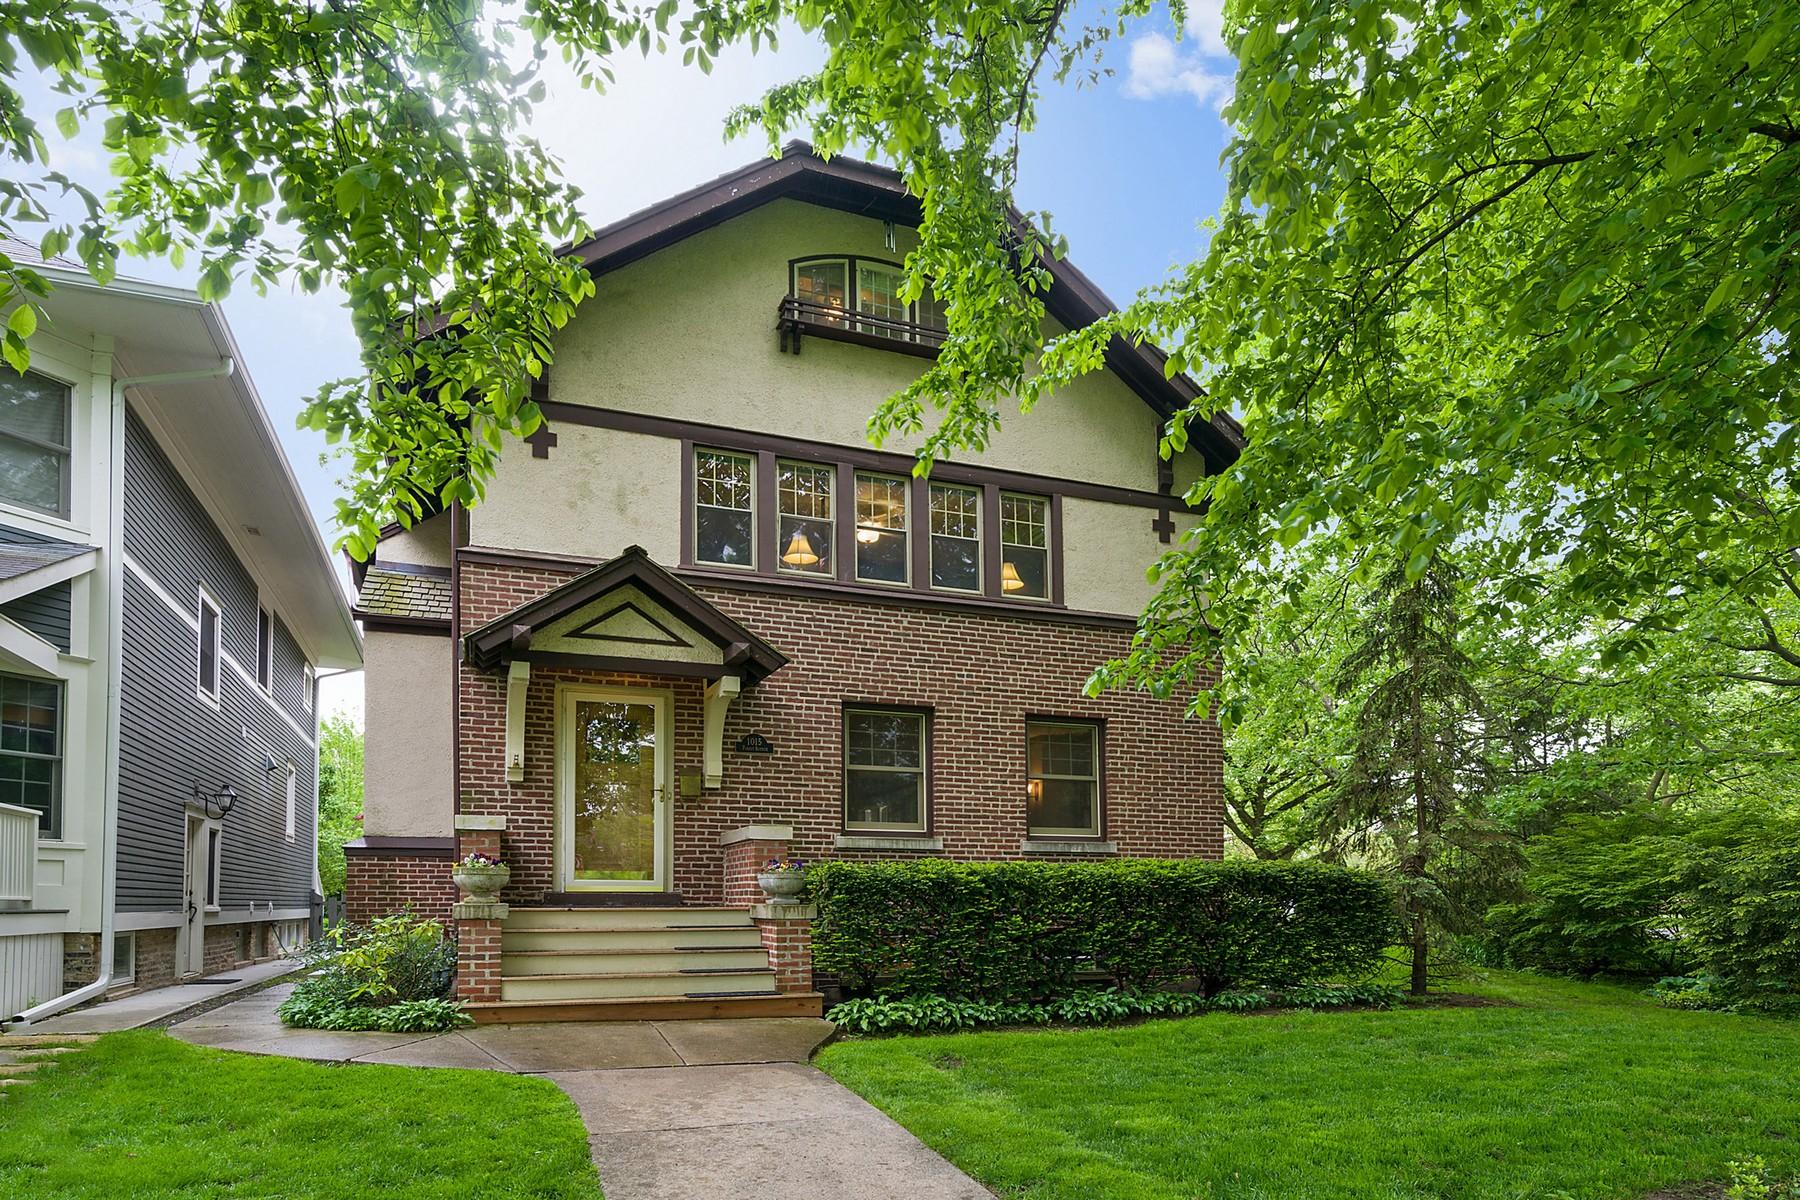 獨棟家庭住宅 為 出售 在 Great five Bedroom home 1015 Forest Wilmette, 伊利諾斯州, 60091 美國